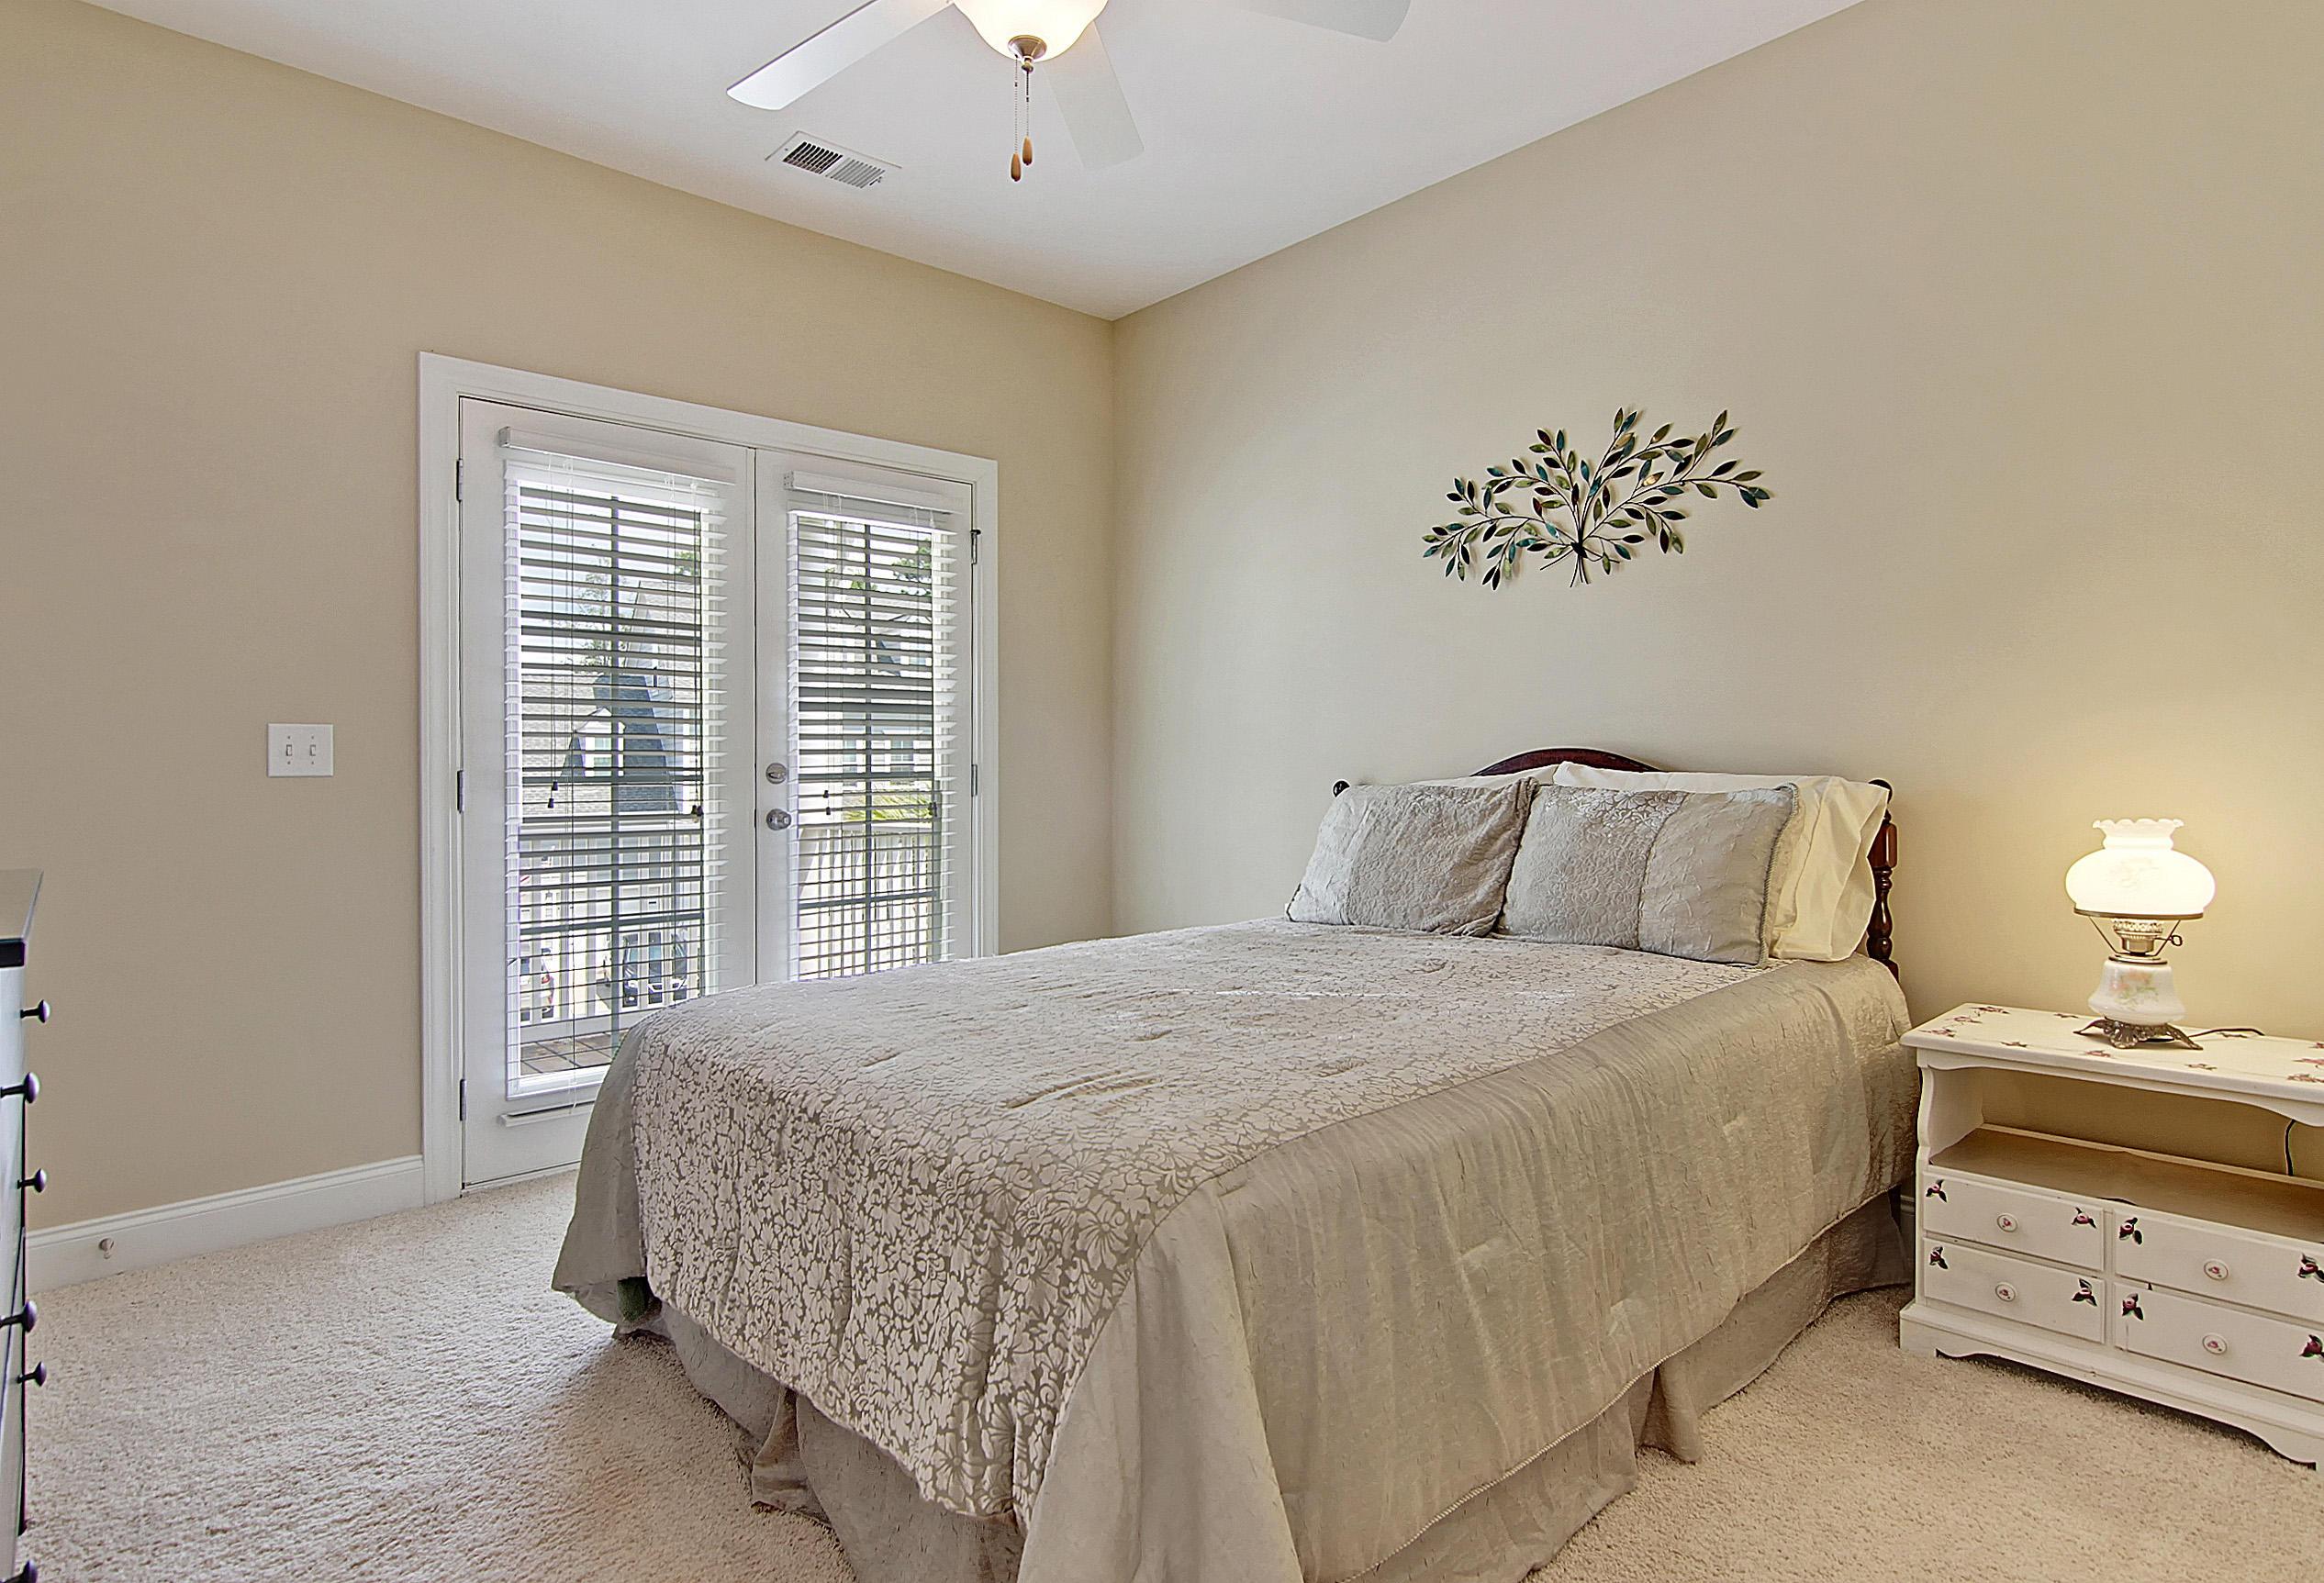 Dunes West Homes For Sale - 1332 Whisker Pole, Mount Pleasant, SC - 37